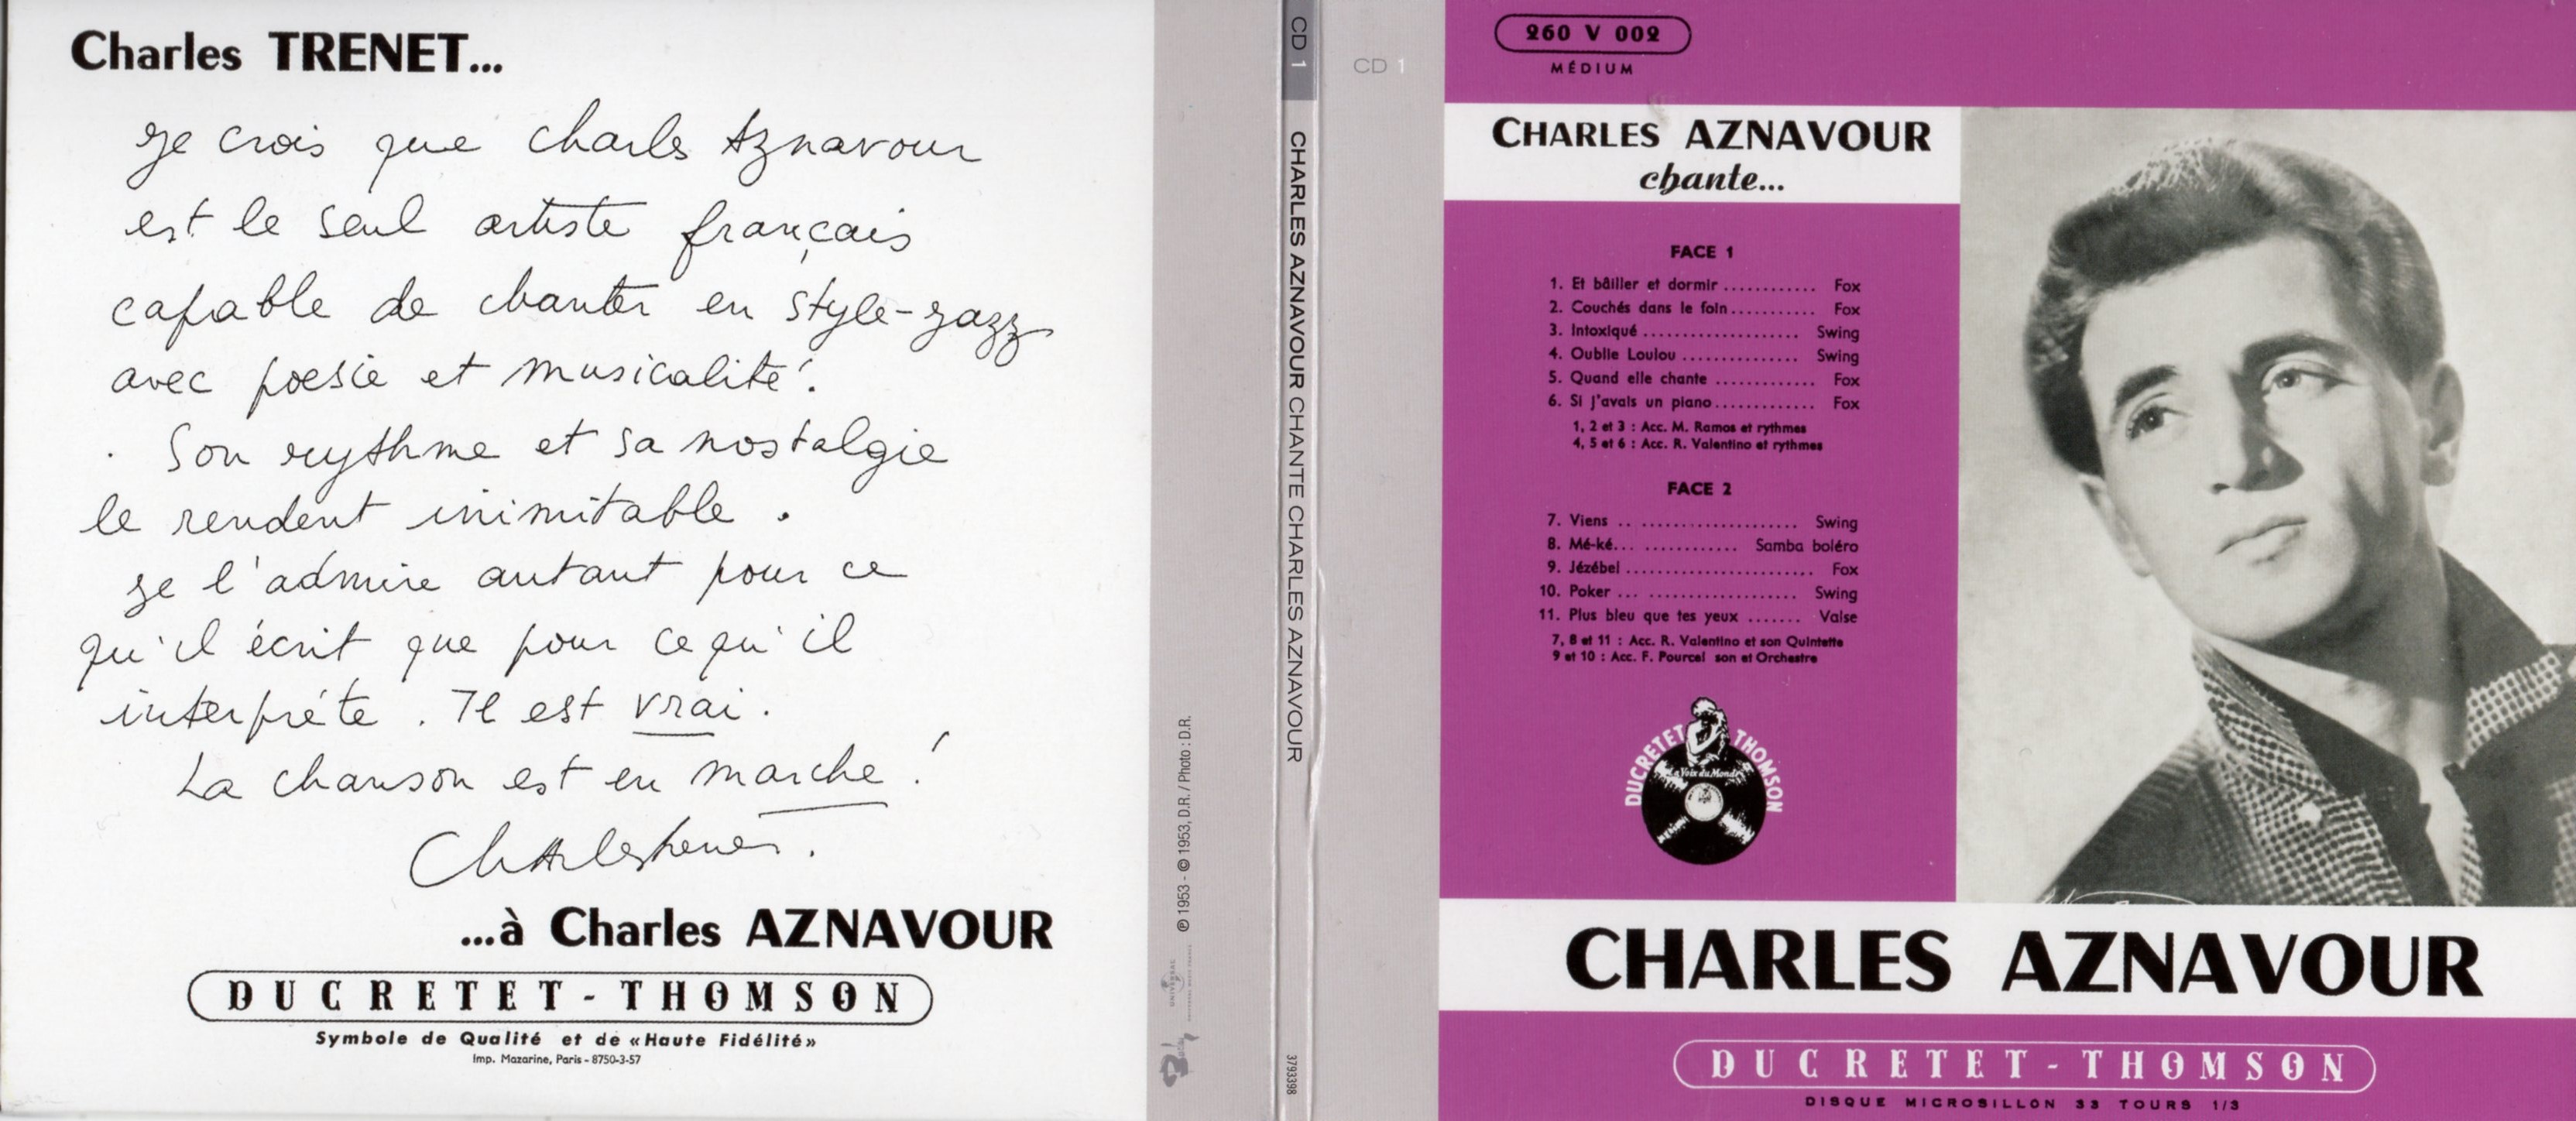 CHARLES AZNAVOUR - Charles Aznavour Chante... (1953) Gatefold Card board REPLICA sleeve - CD